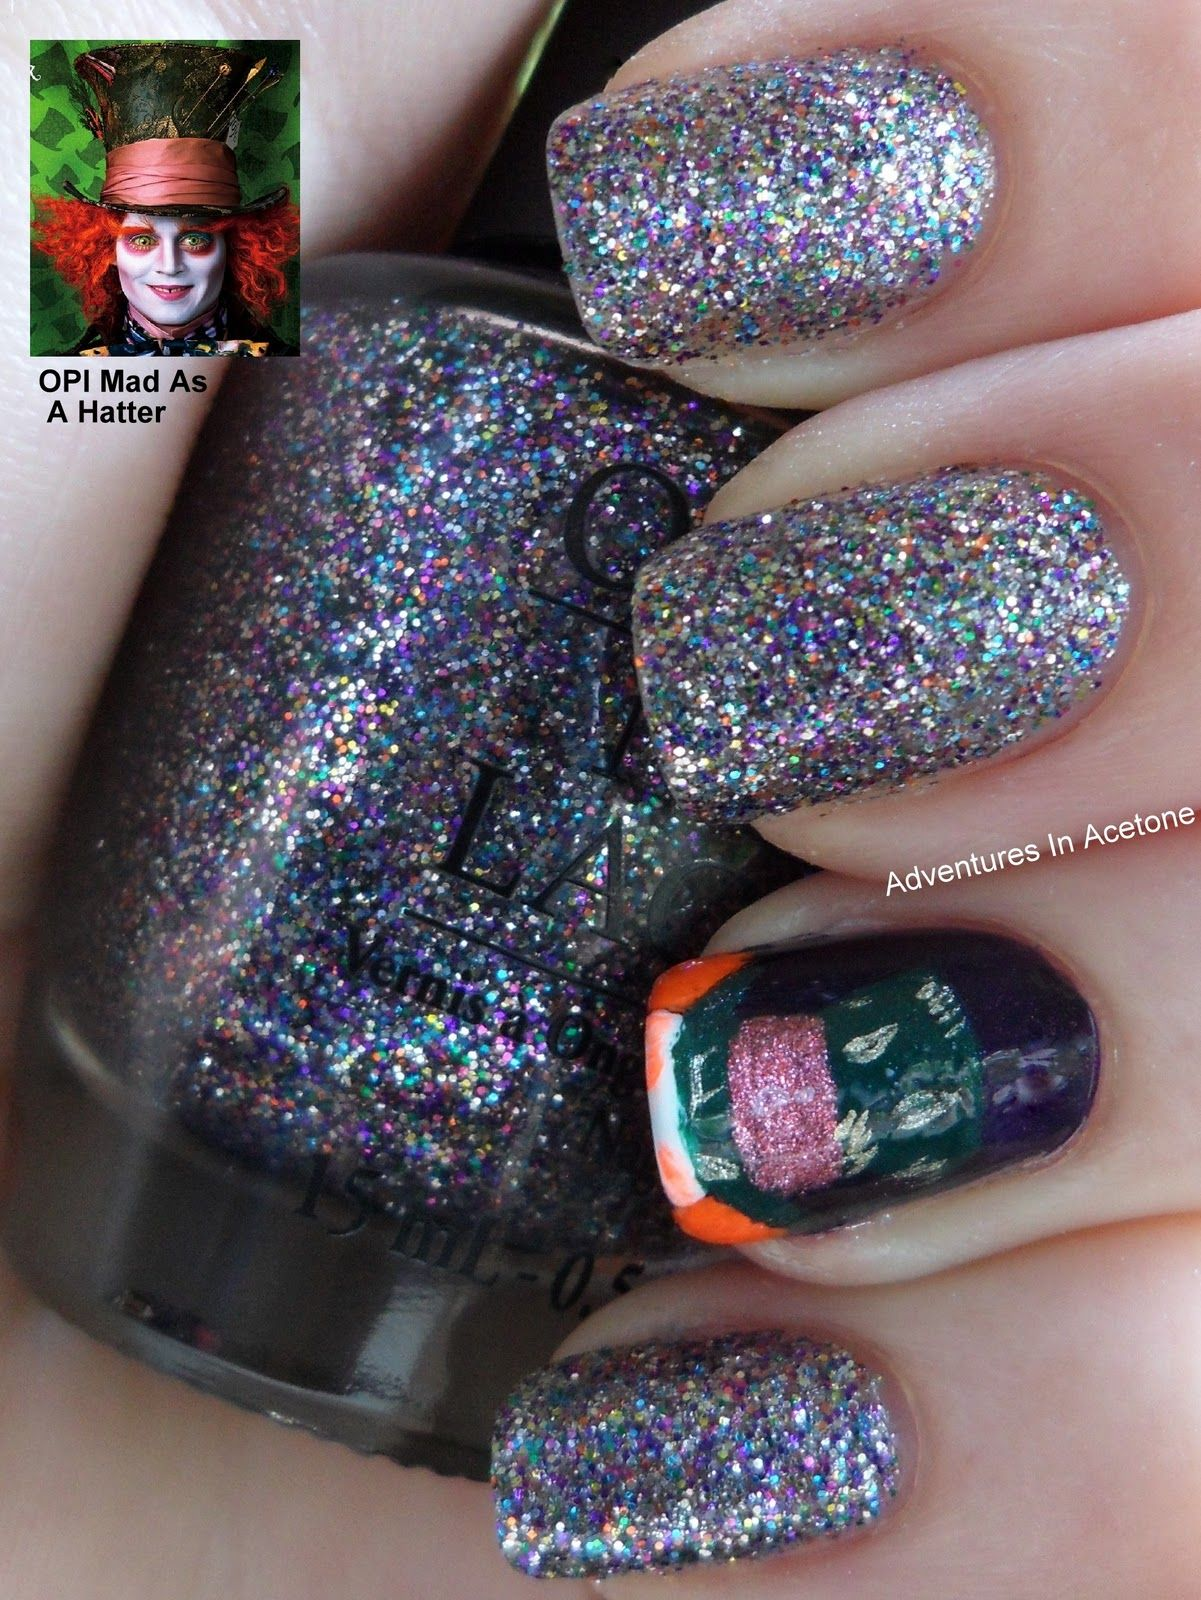 Pin by Ashley King on Glitter! | Pinterest